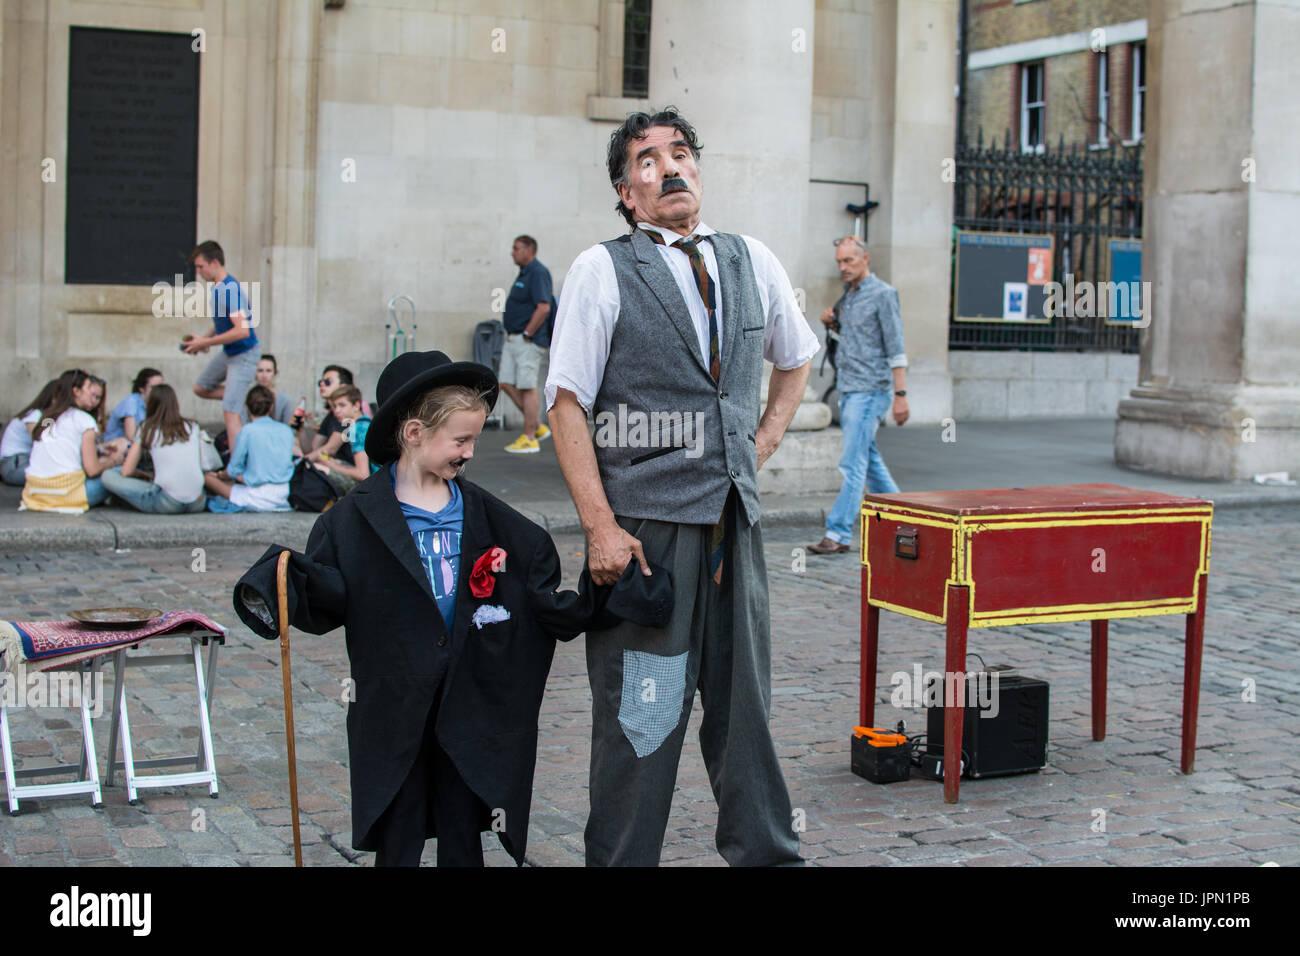 Covent Garden - Stock Image